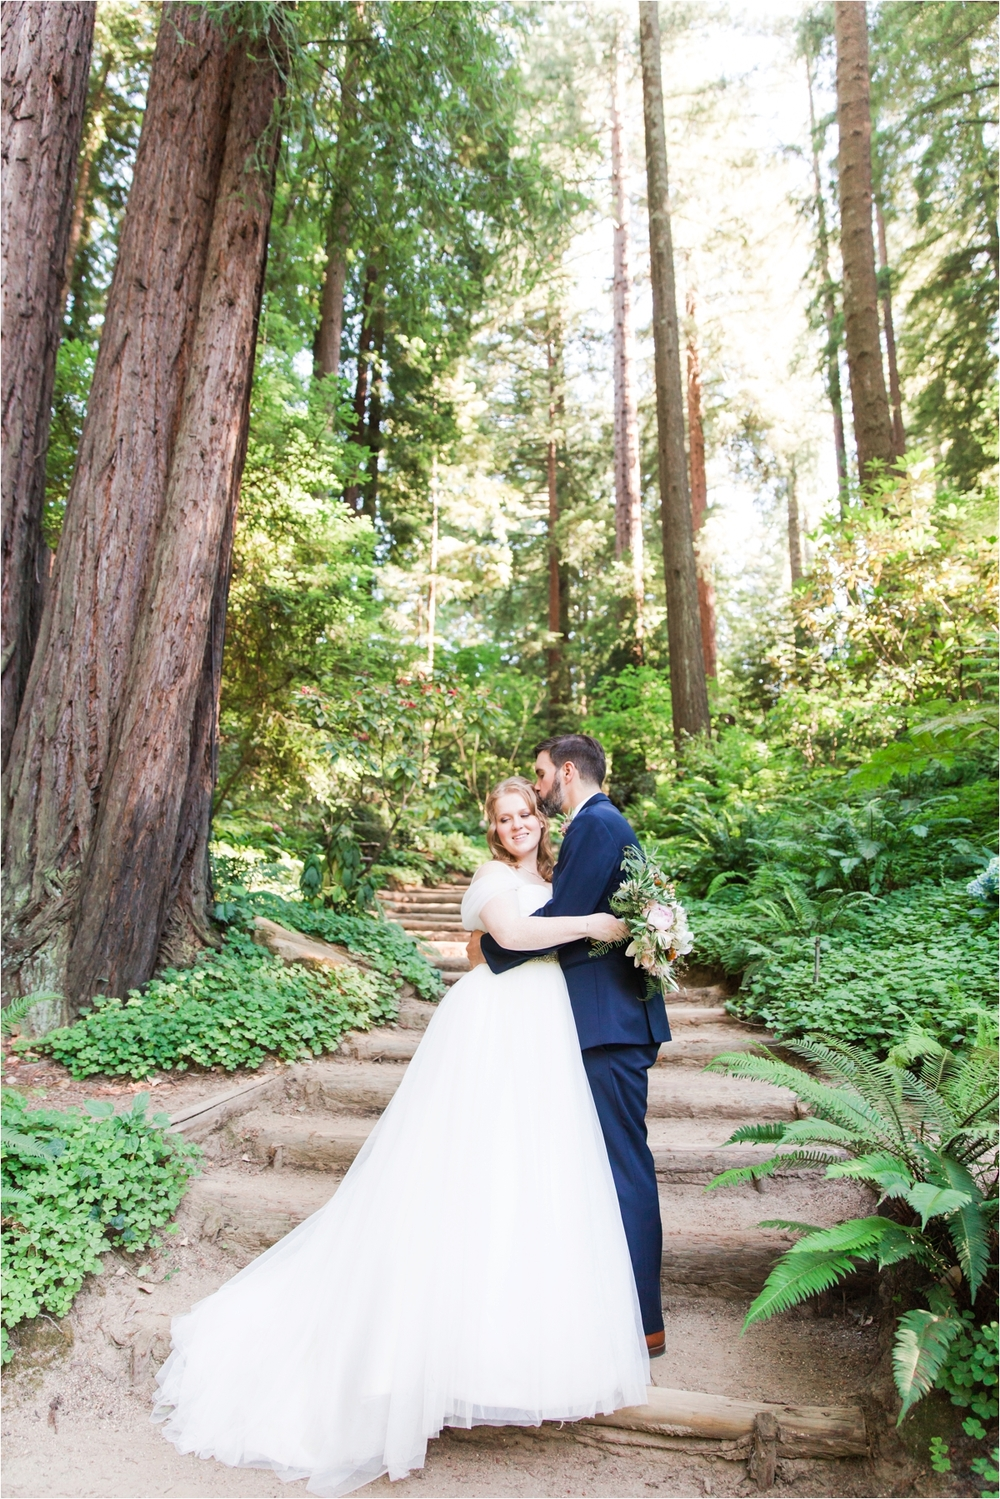 Nestldown wedding Photos by Briana Calderon Photography_0154.jpg